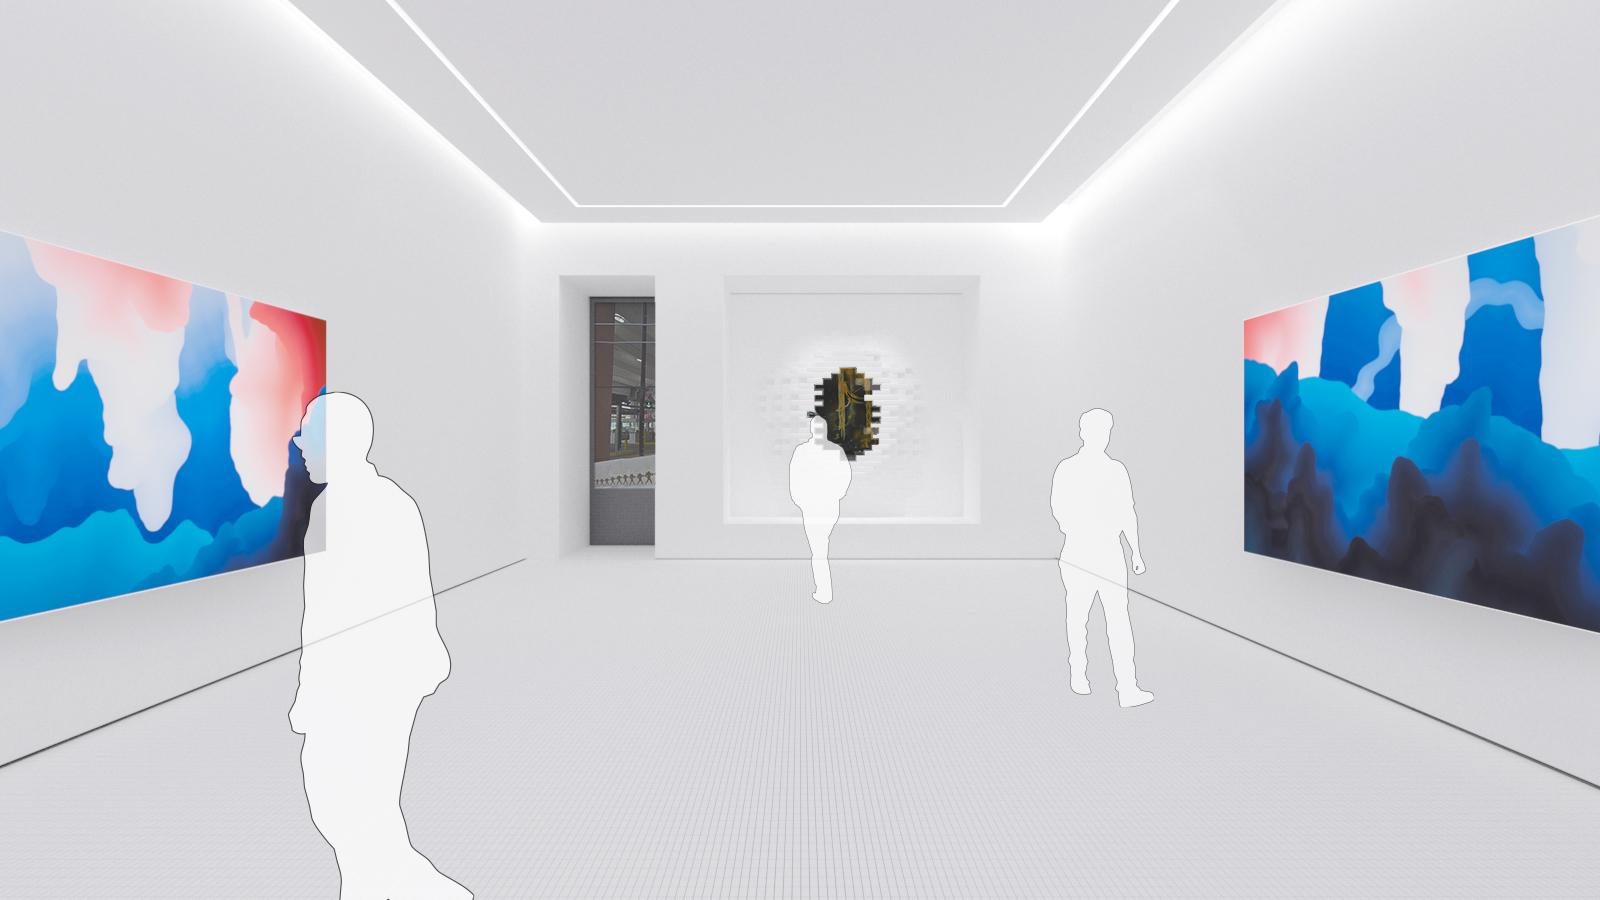 Illustration of an art gallery